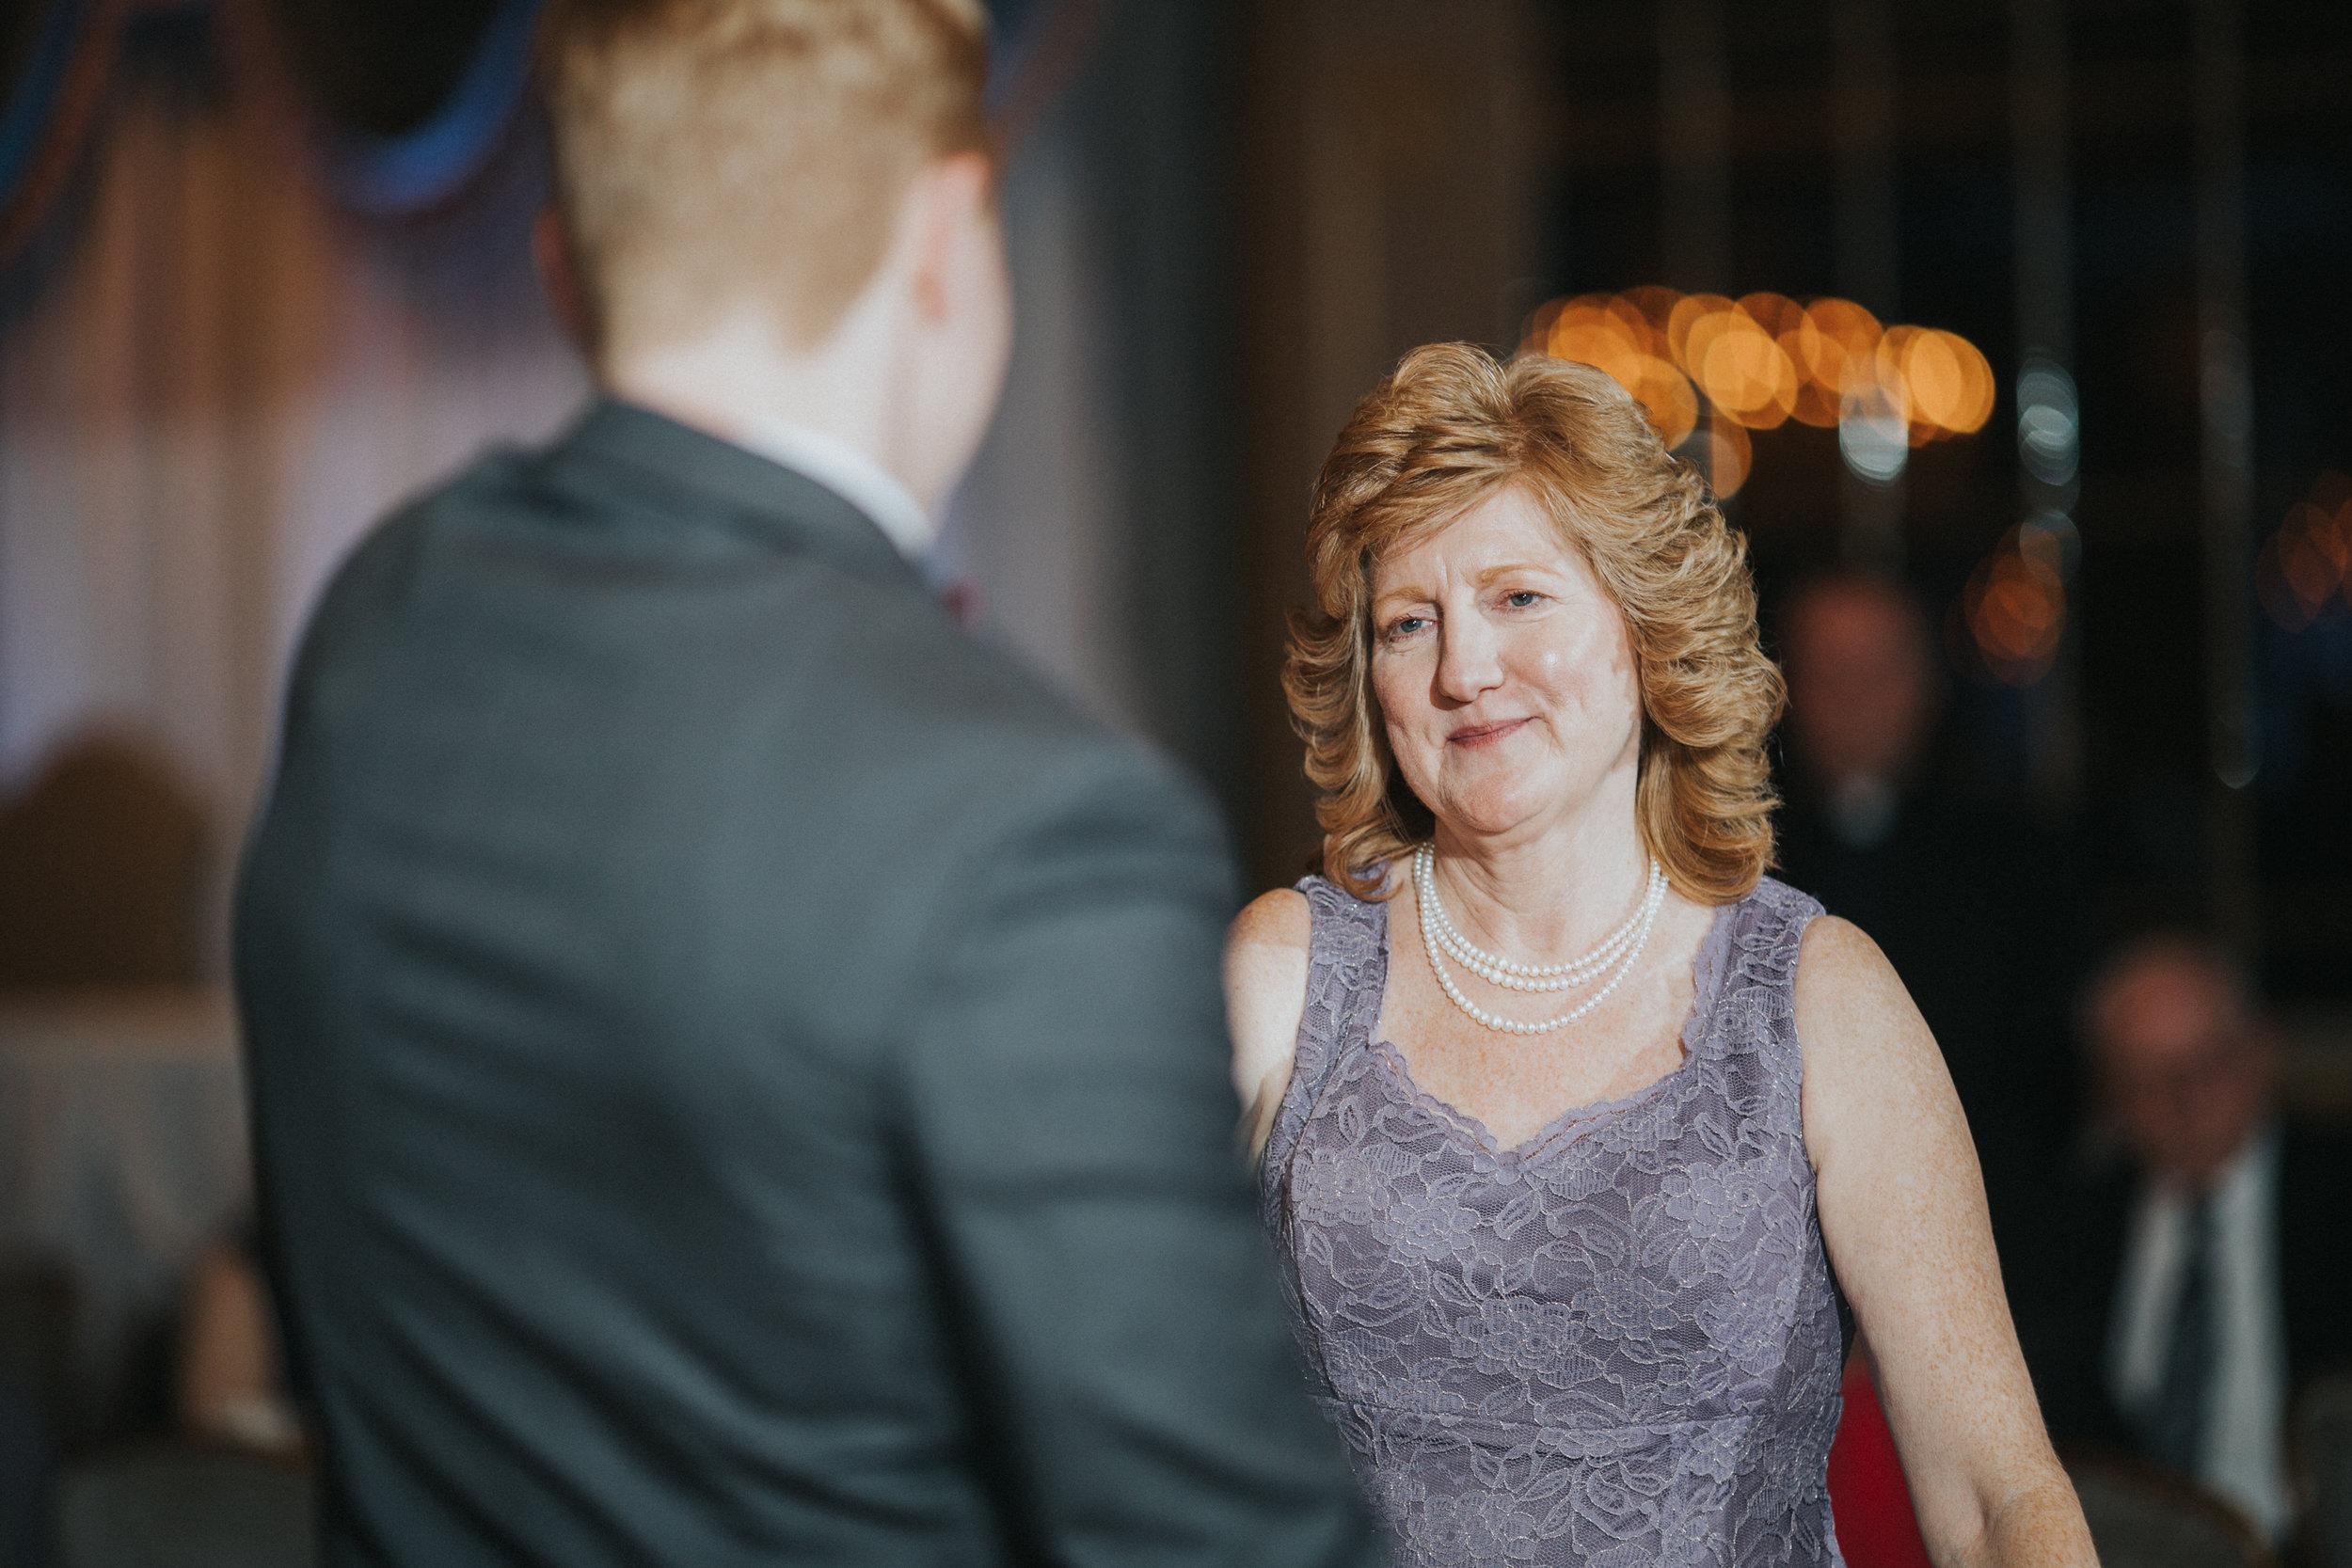 New-Jersey-Wedding-Photography-Fishers-Tudor-House-JennaLynnPhotography-Reception-Kathleen&Eddie-39.jpg